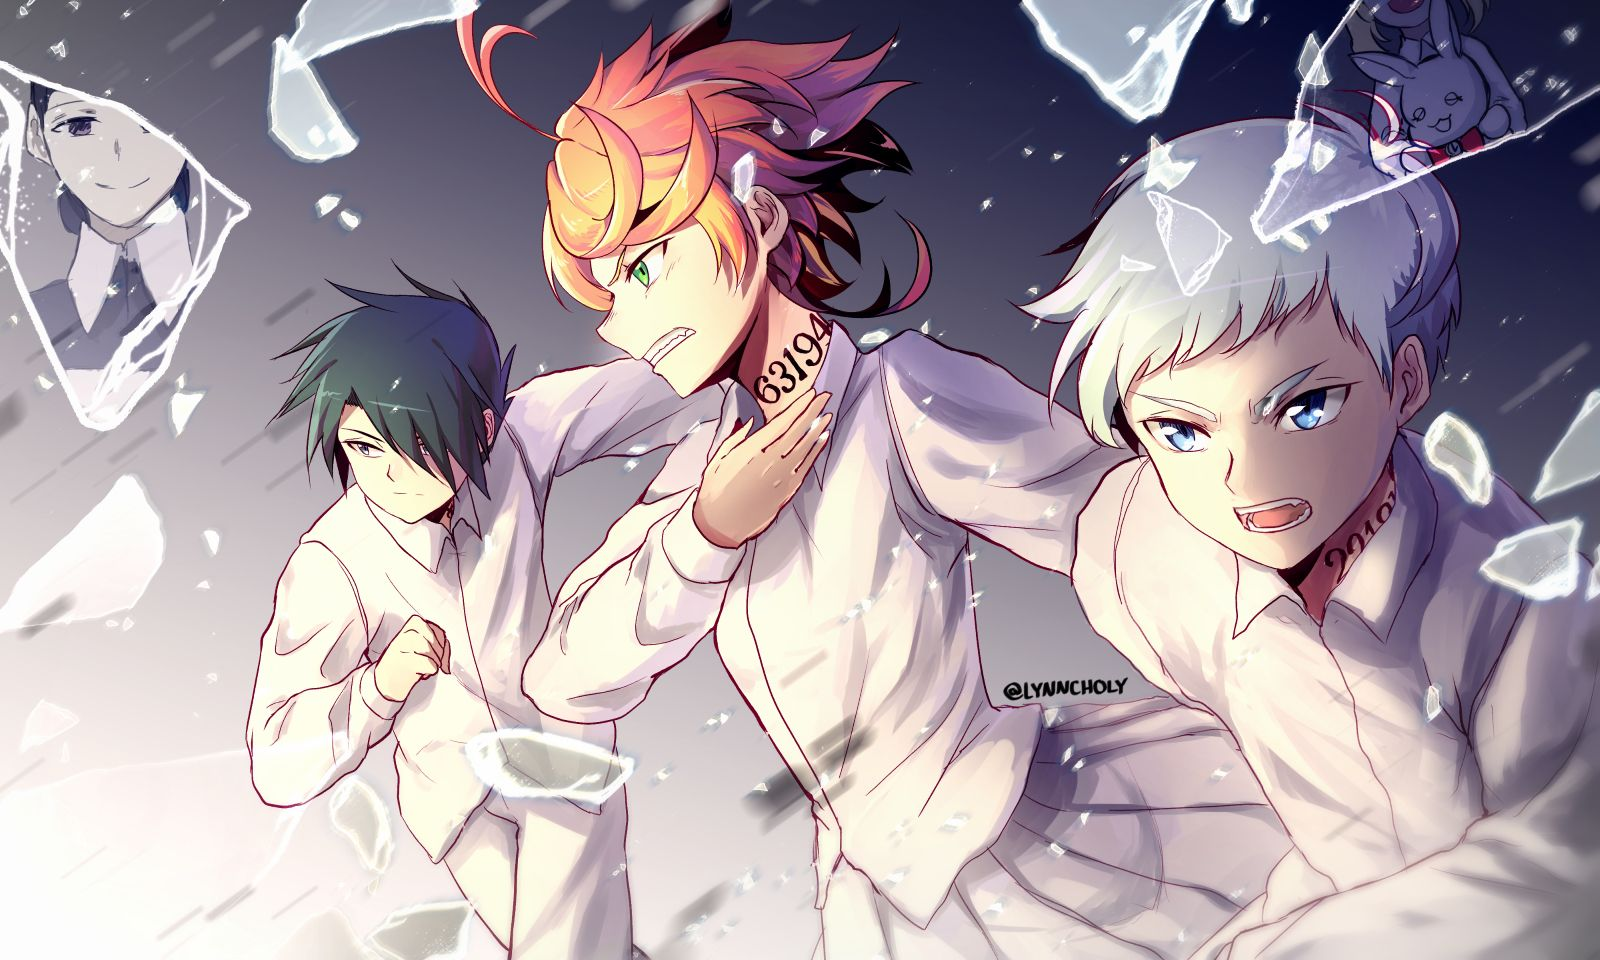 Pin By Thaotaku On Anime Neverland Art Neverland Anime